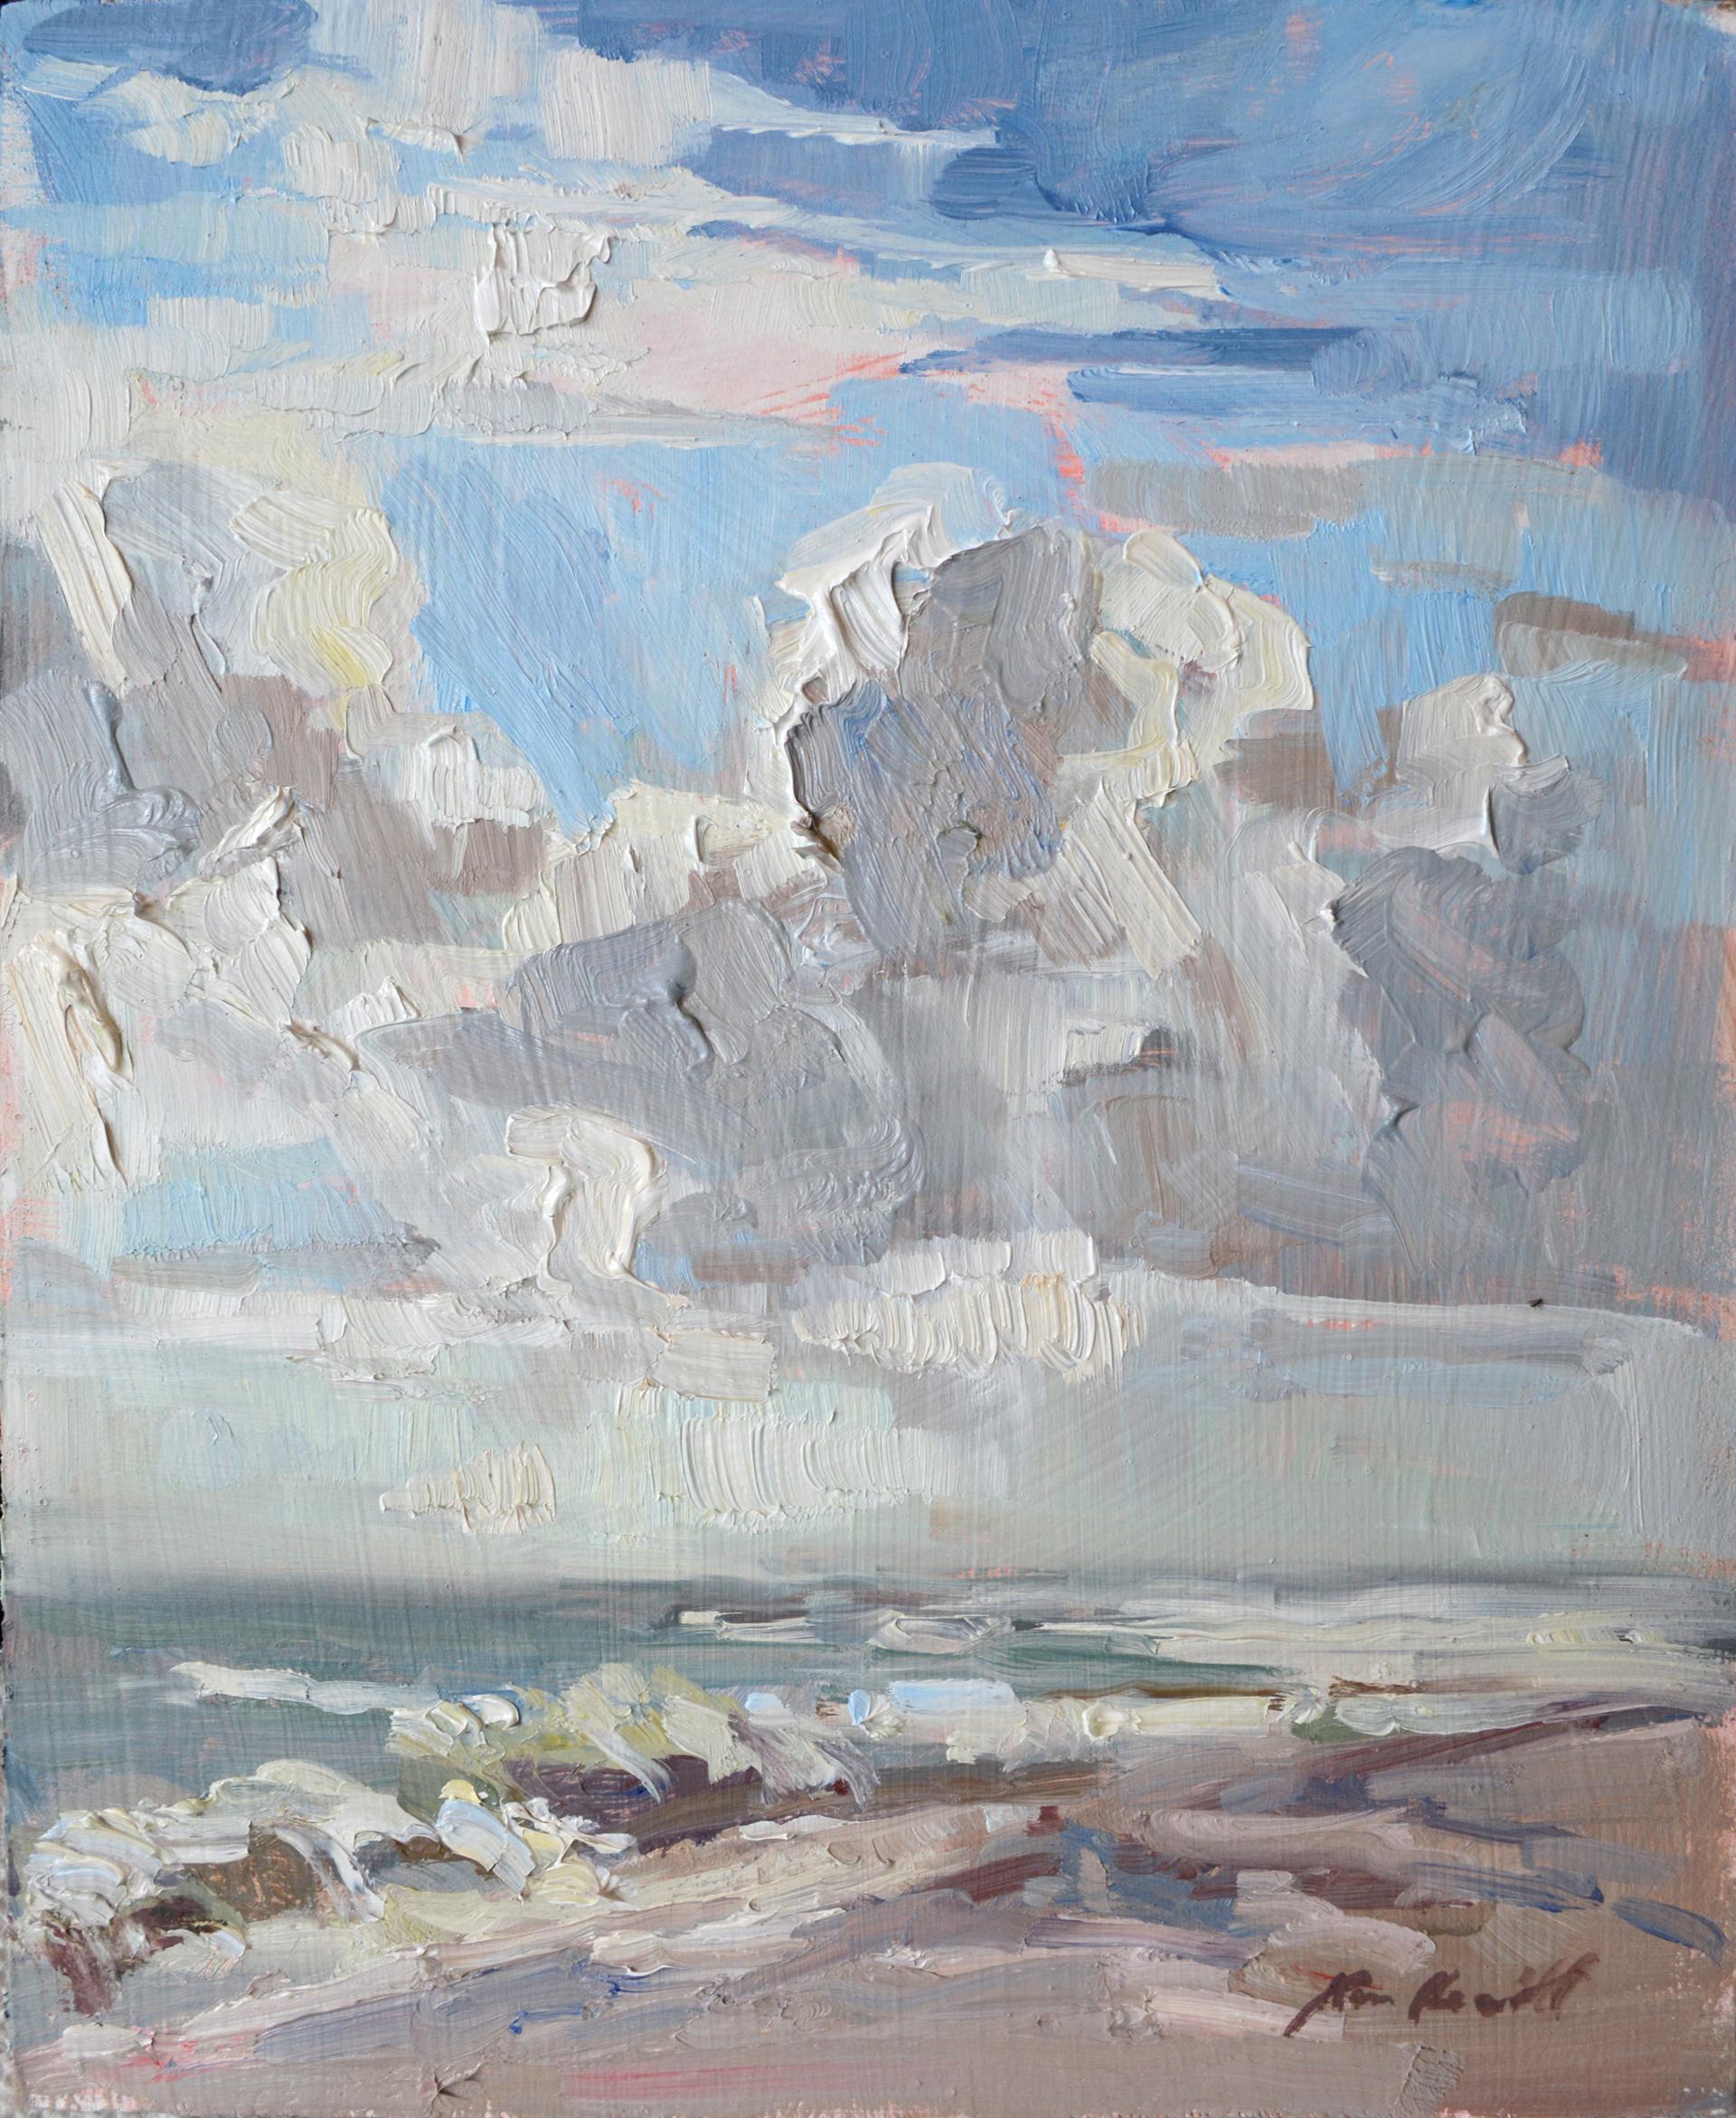 Building Clouds on the Beach by Karen Hewitt Hagan